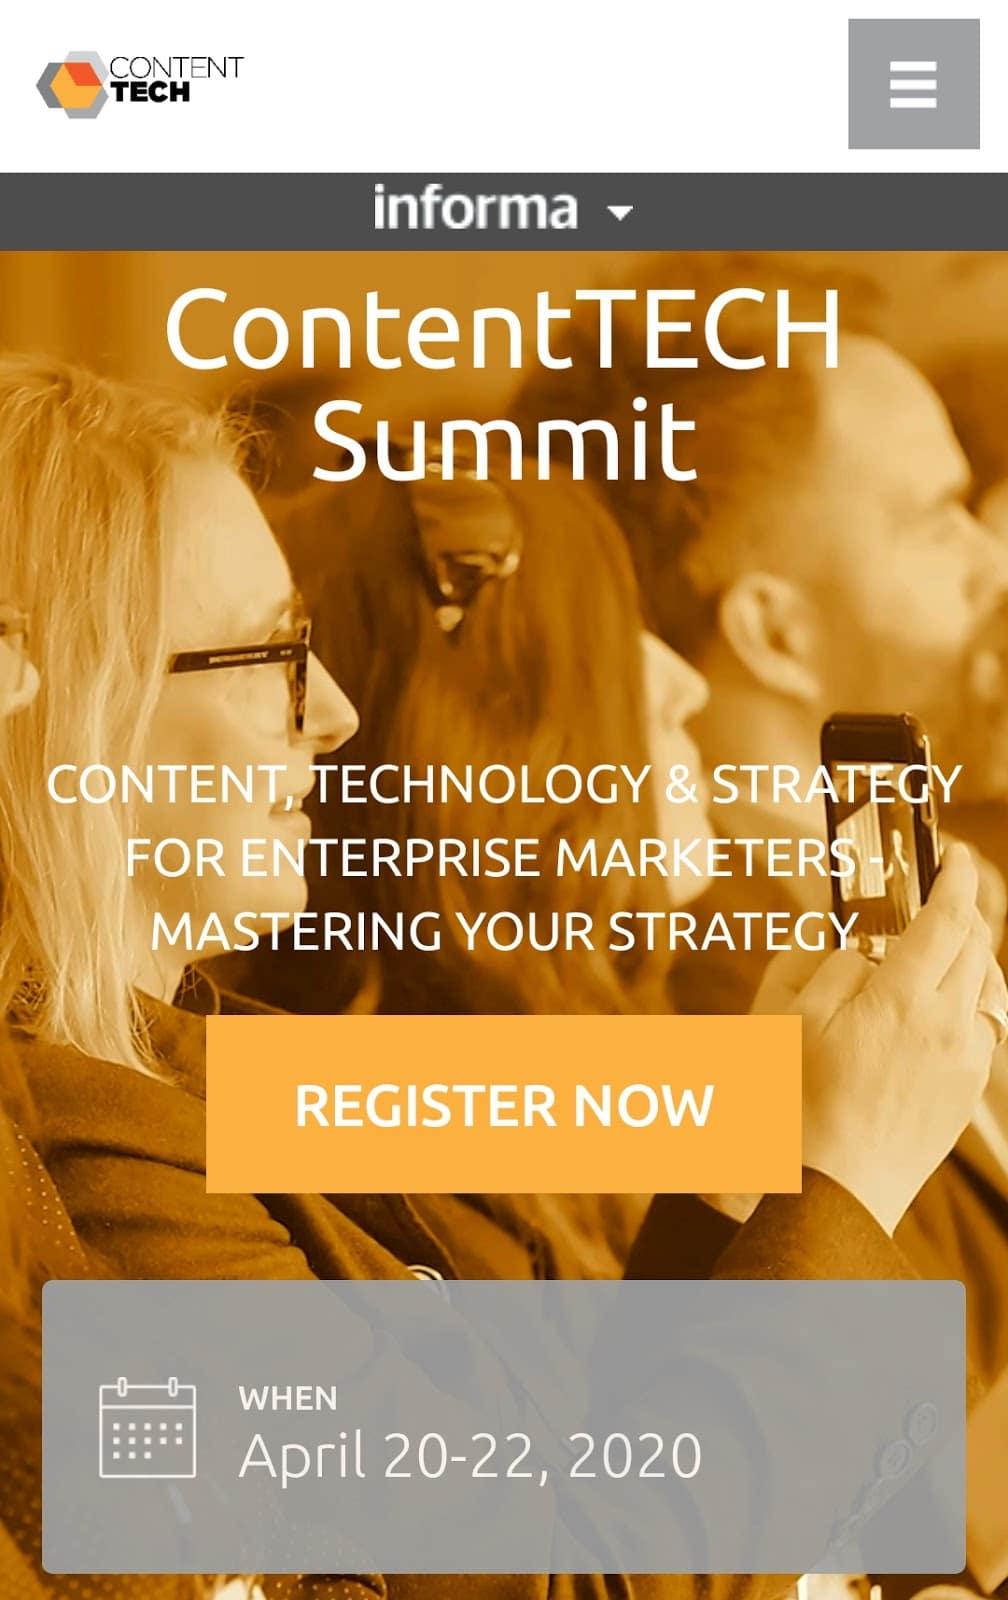 contenttech mobile landing page